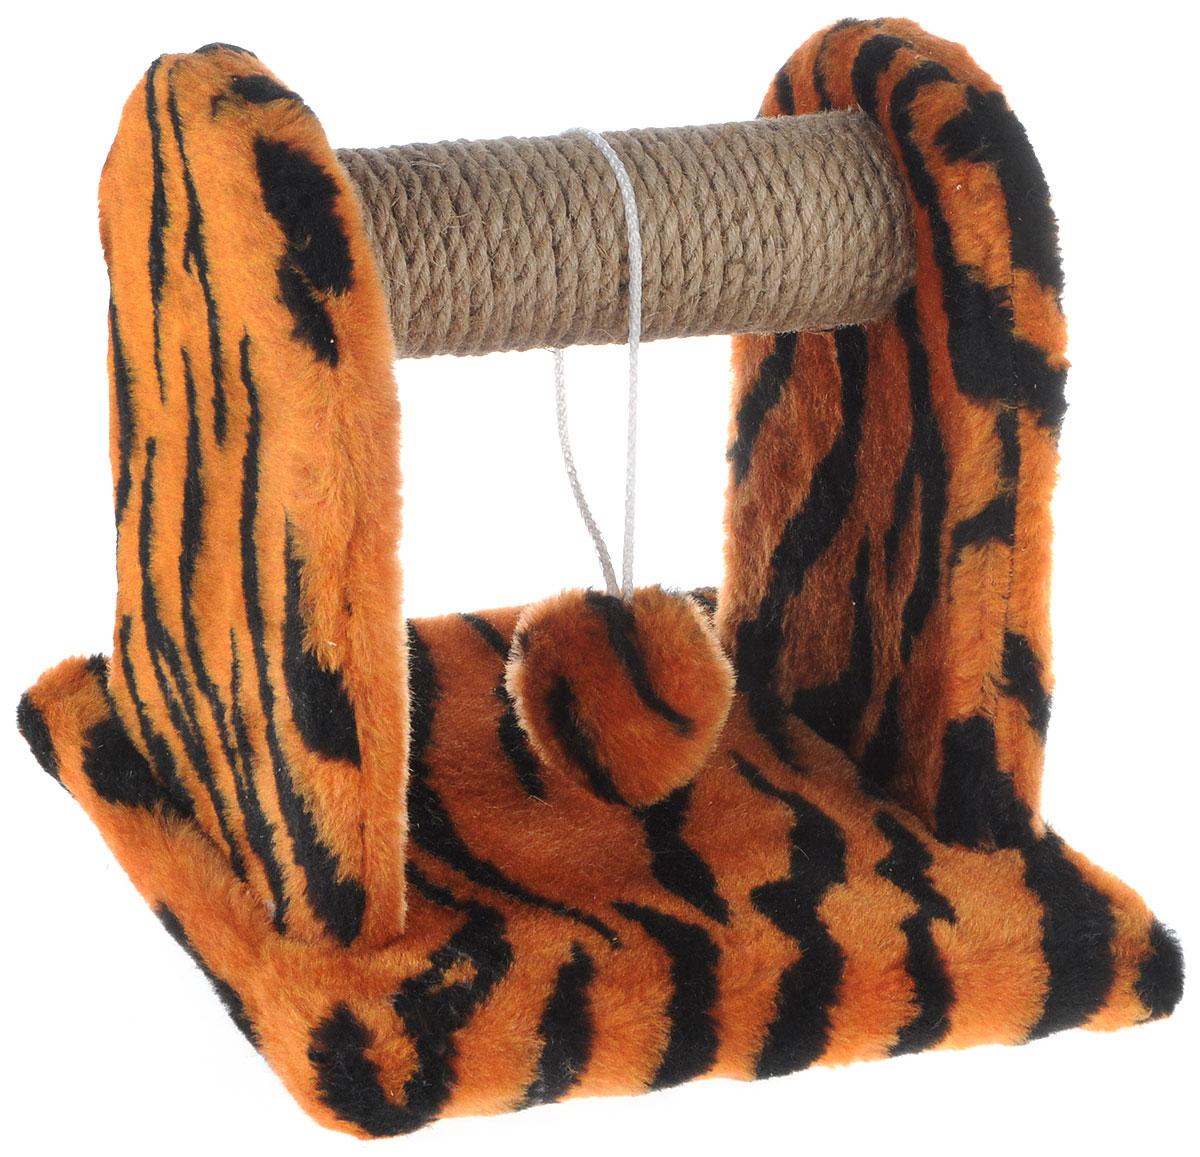 Когтеточка для котят Меридиан Тигровая, с игрушкой, 26 х 26 х 28 смК701Т